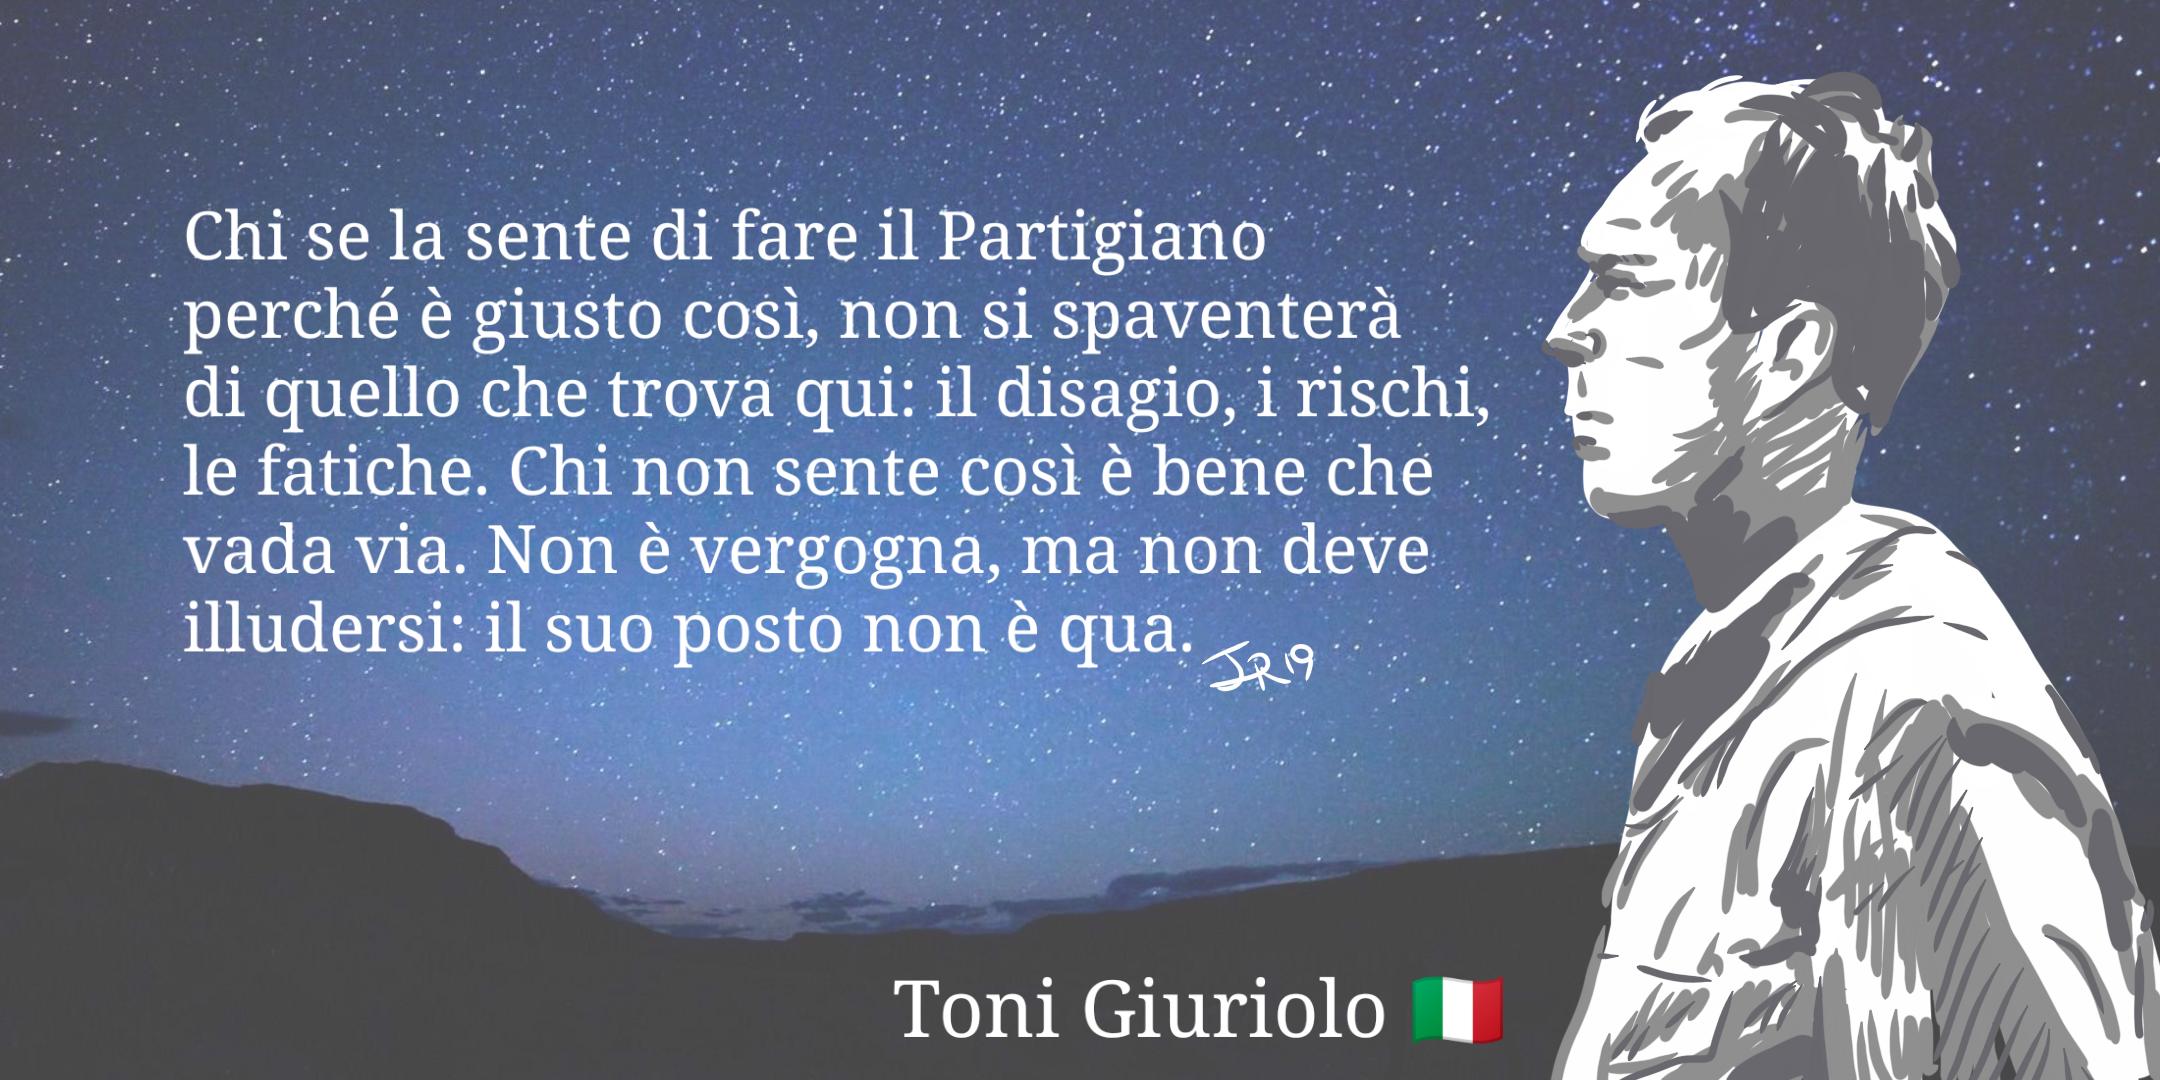 Toni Giuriolo